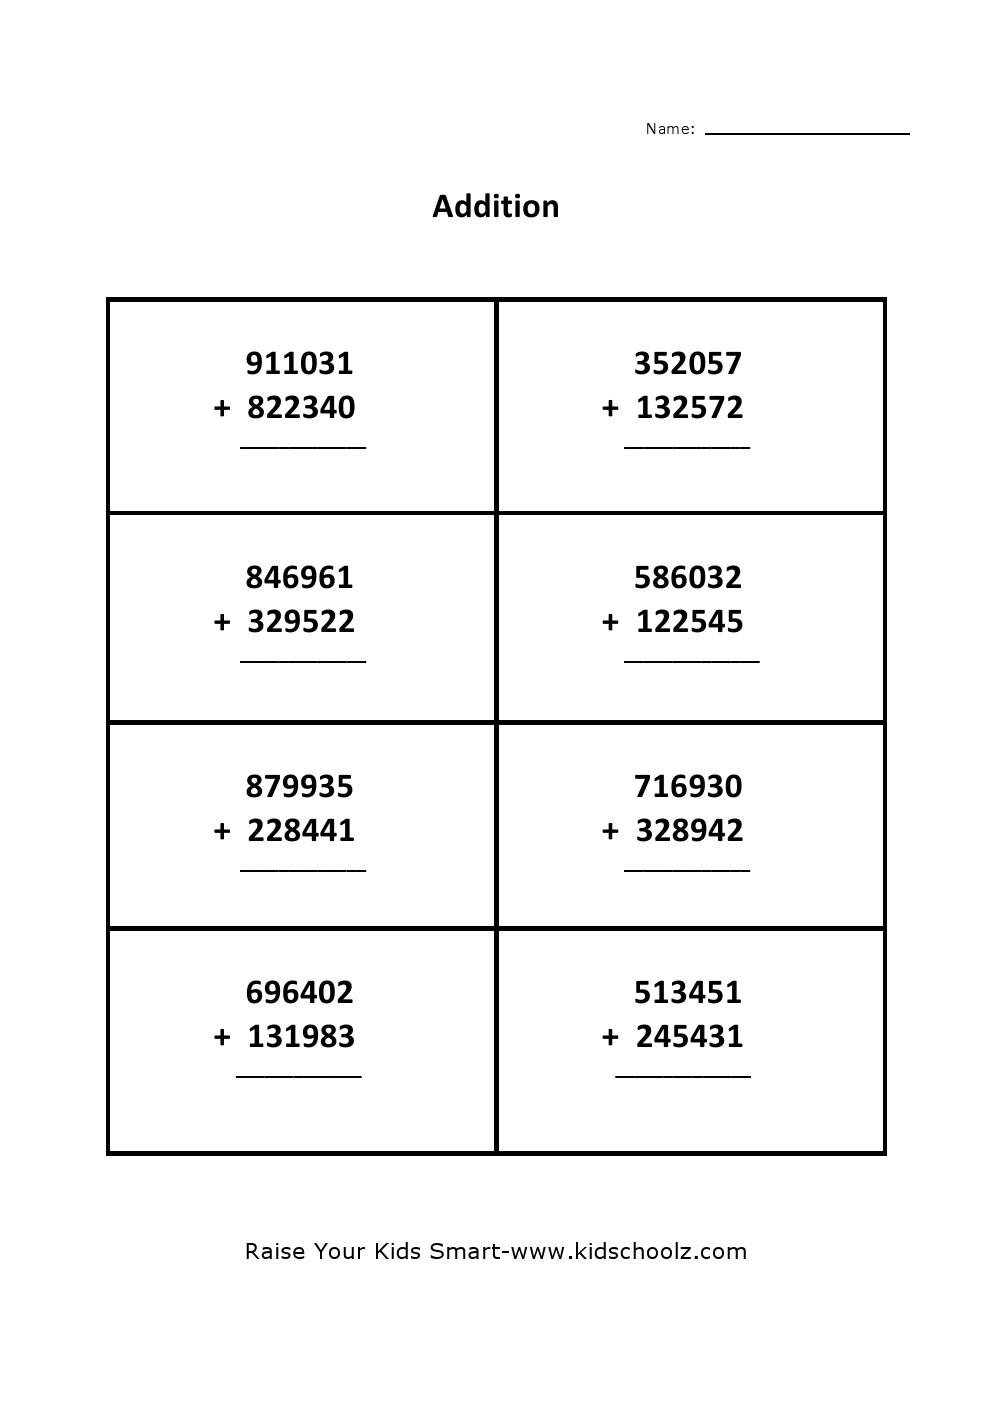 hight resolution of Grade 5 - Addition Worksheet 1 - Kidschoolz